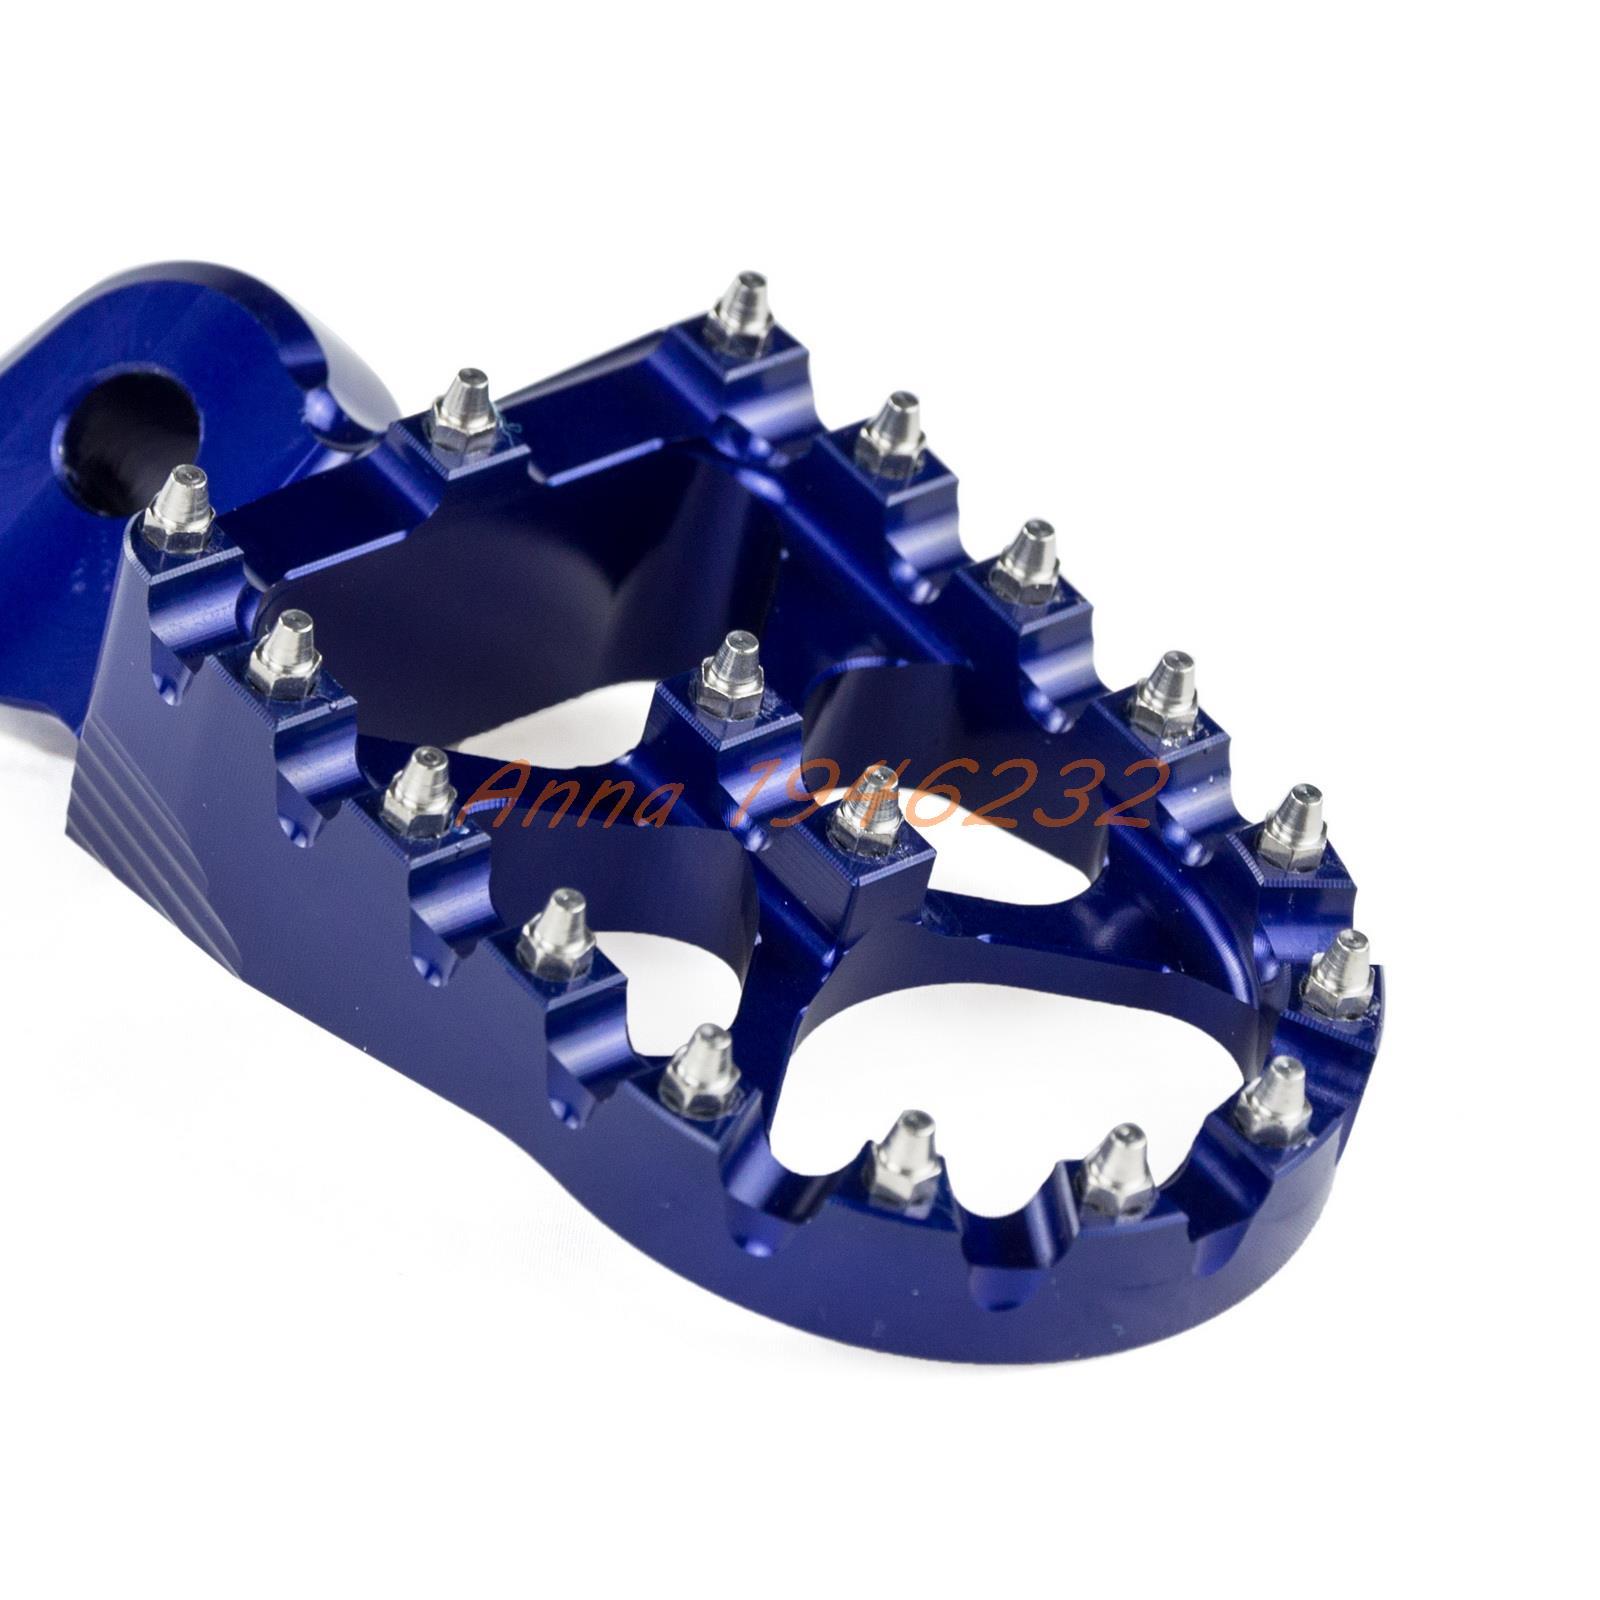 57mm-7075-Blue-Wide-Footrests-Foot-Pegs-For-Yamaha-YZ85-YZ125-YZ250-YZ125X-YZ250X-YZ250F-YZ450F-4